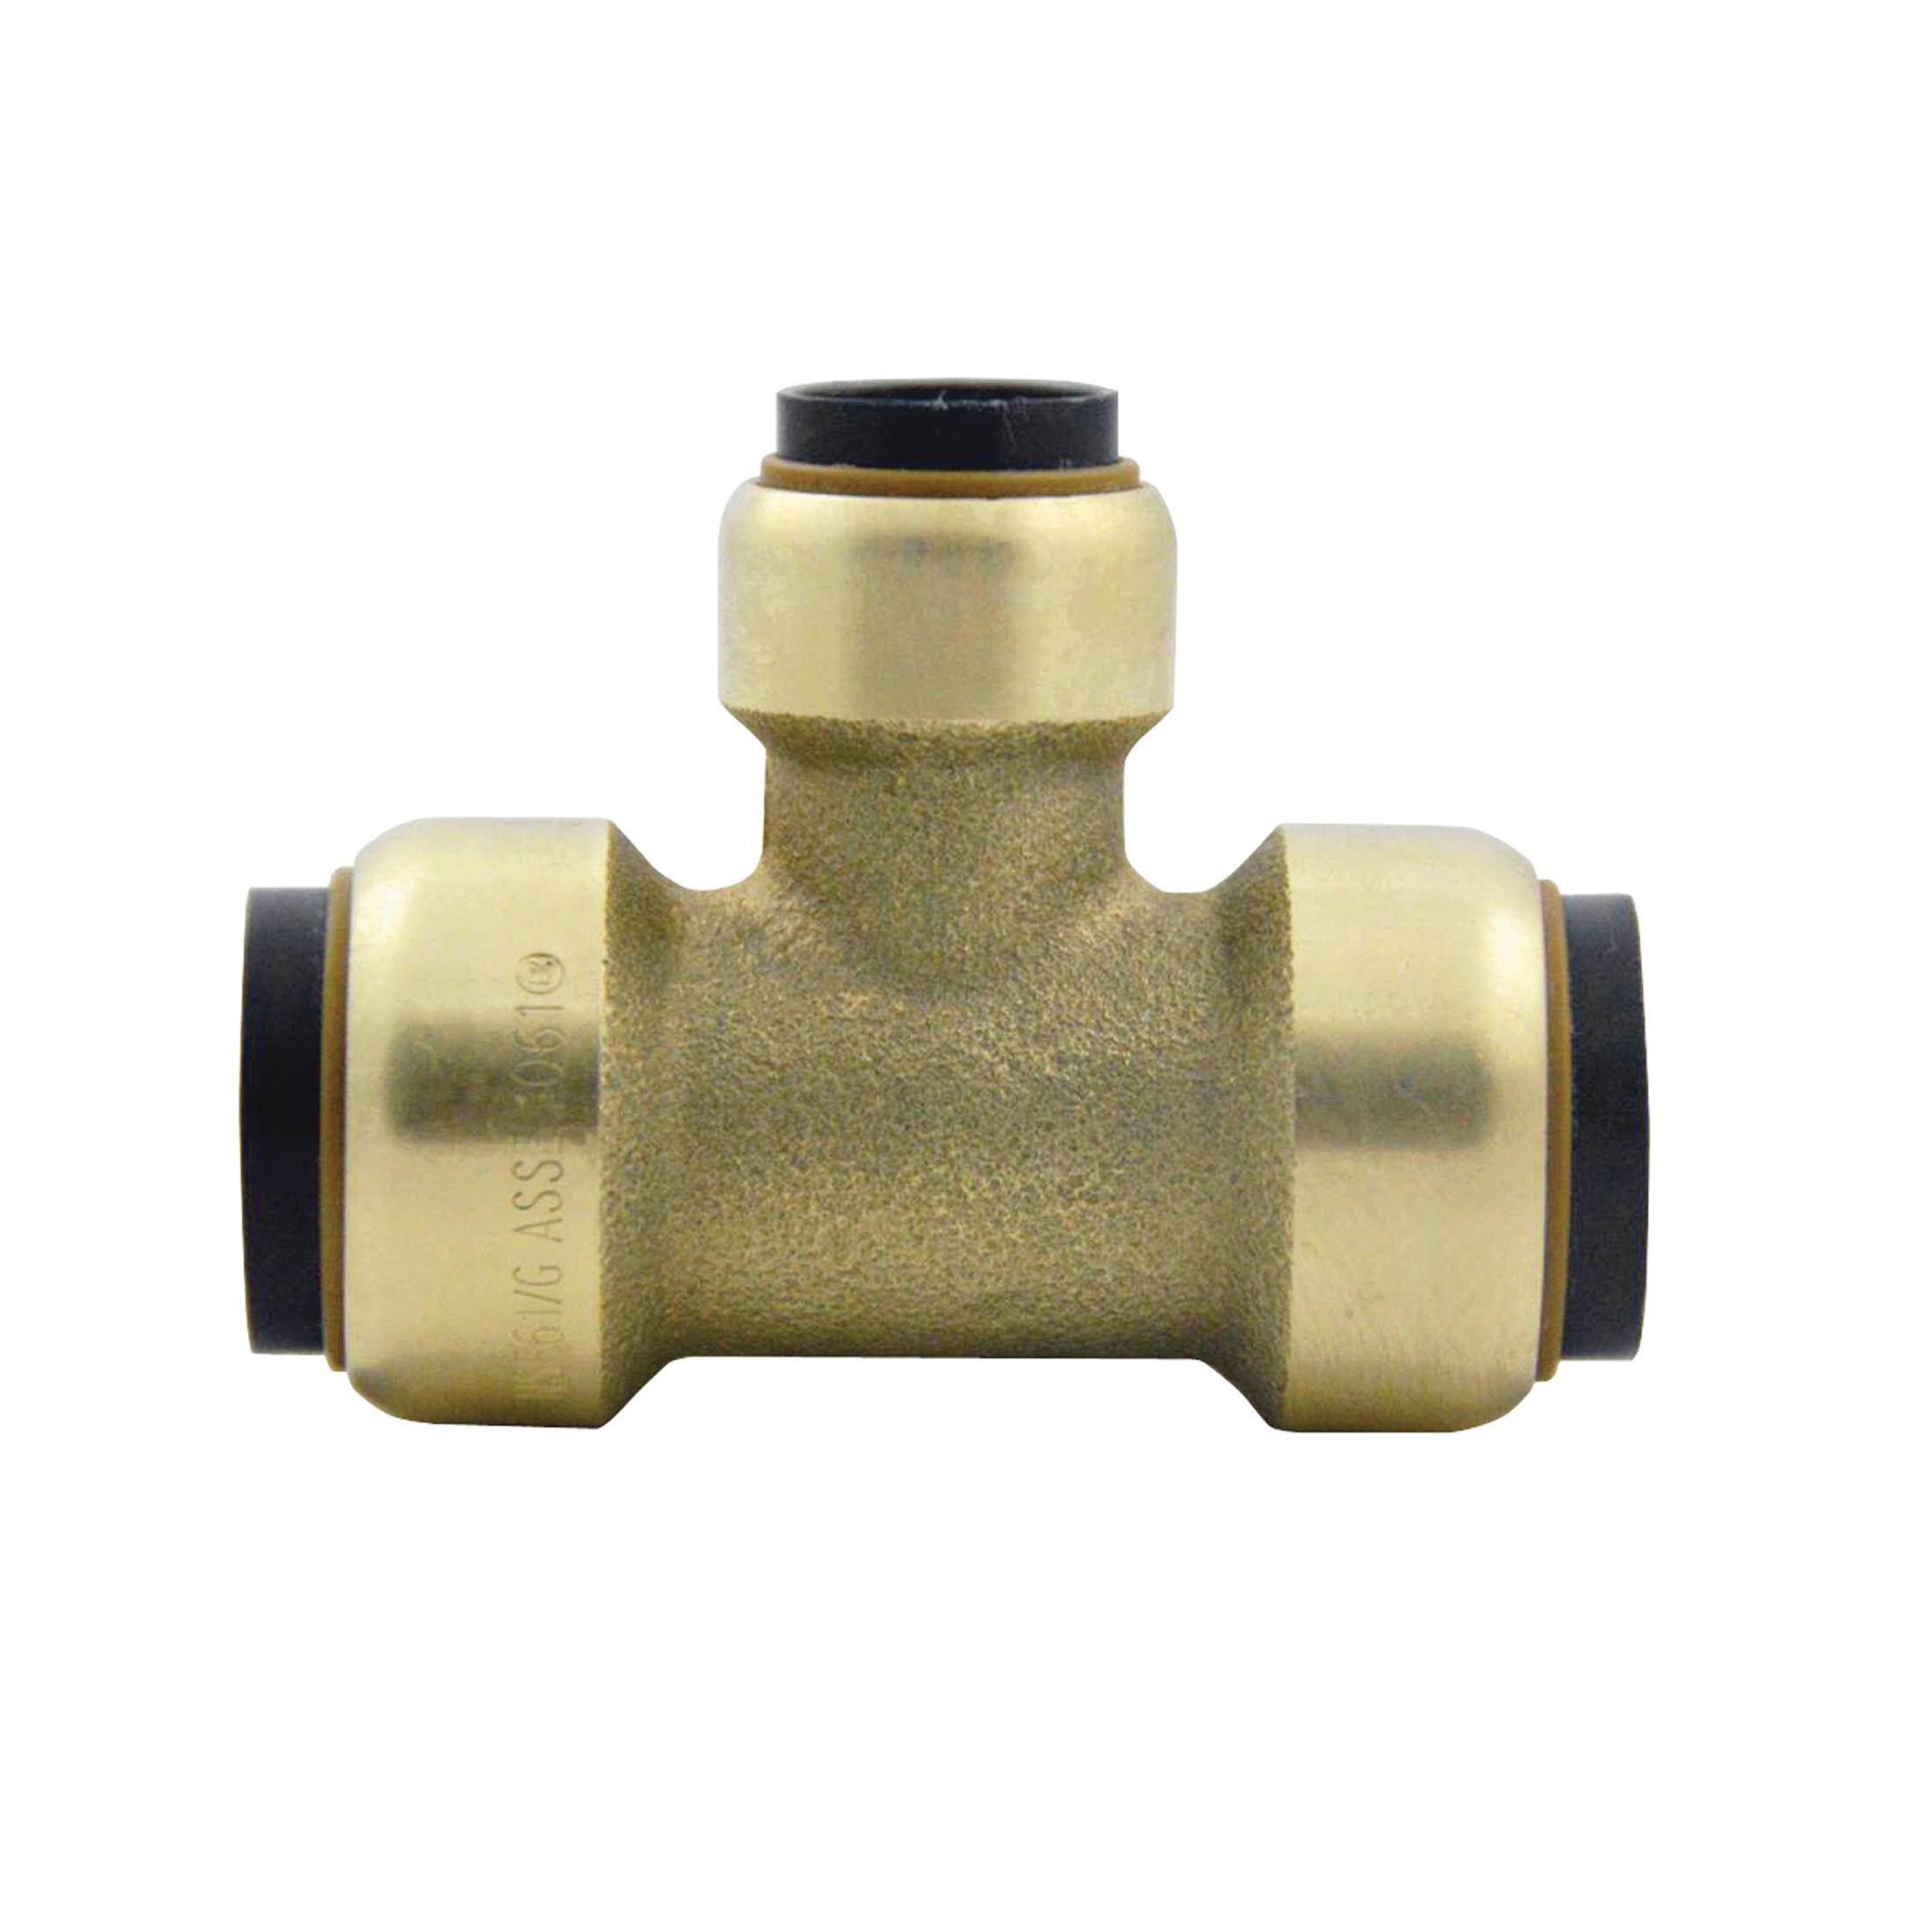 EPC TECTITE™ 10155490 211R Push Reducer Tee, 3/4 x 1/2 x 1/2 in, C x C x C, Brass